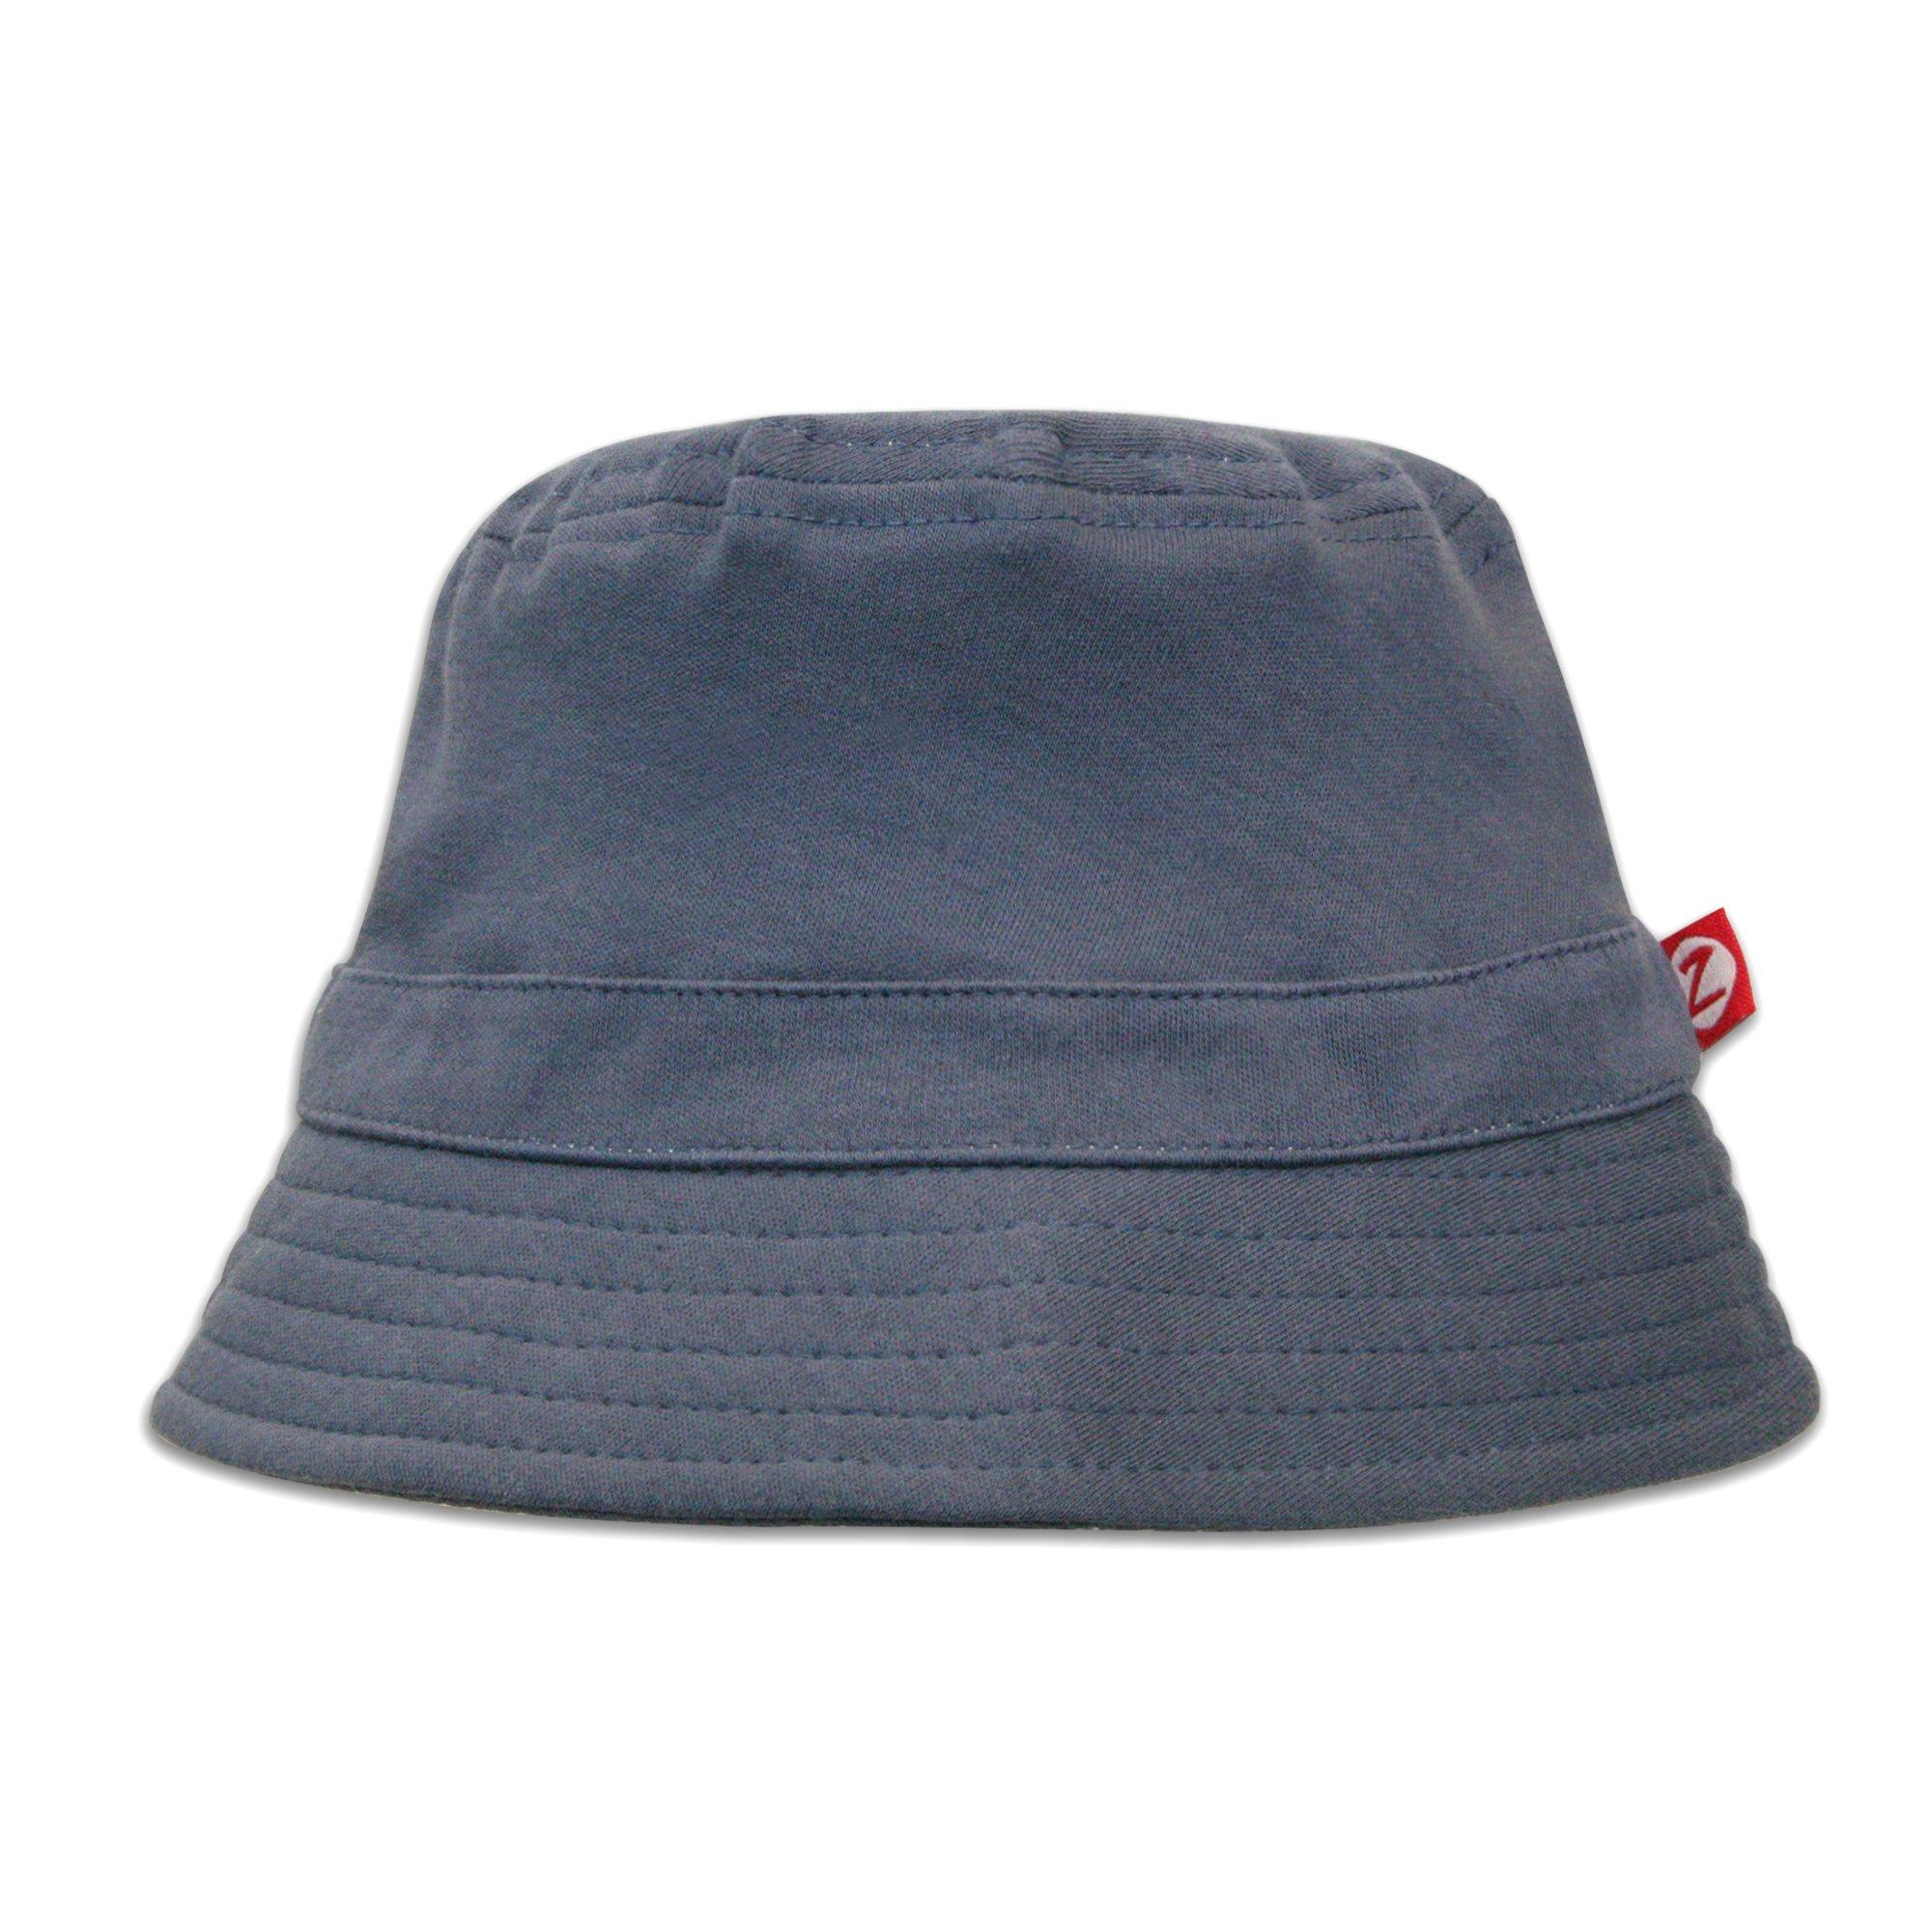 Zutano Baby & Toddler Bucket Sun Hat, UPF 30+ Protection, 4T, Denim Navy